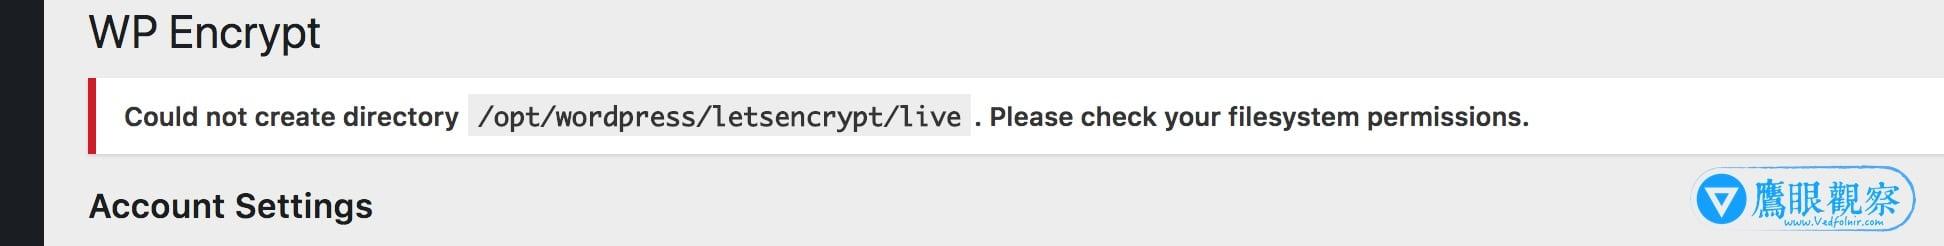 WordPress WP Encrypt SSL Error Filesystem Permissions WordPress 教學:SSL 安全憑證產生器外掛程式「WP Encrypt」